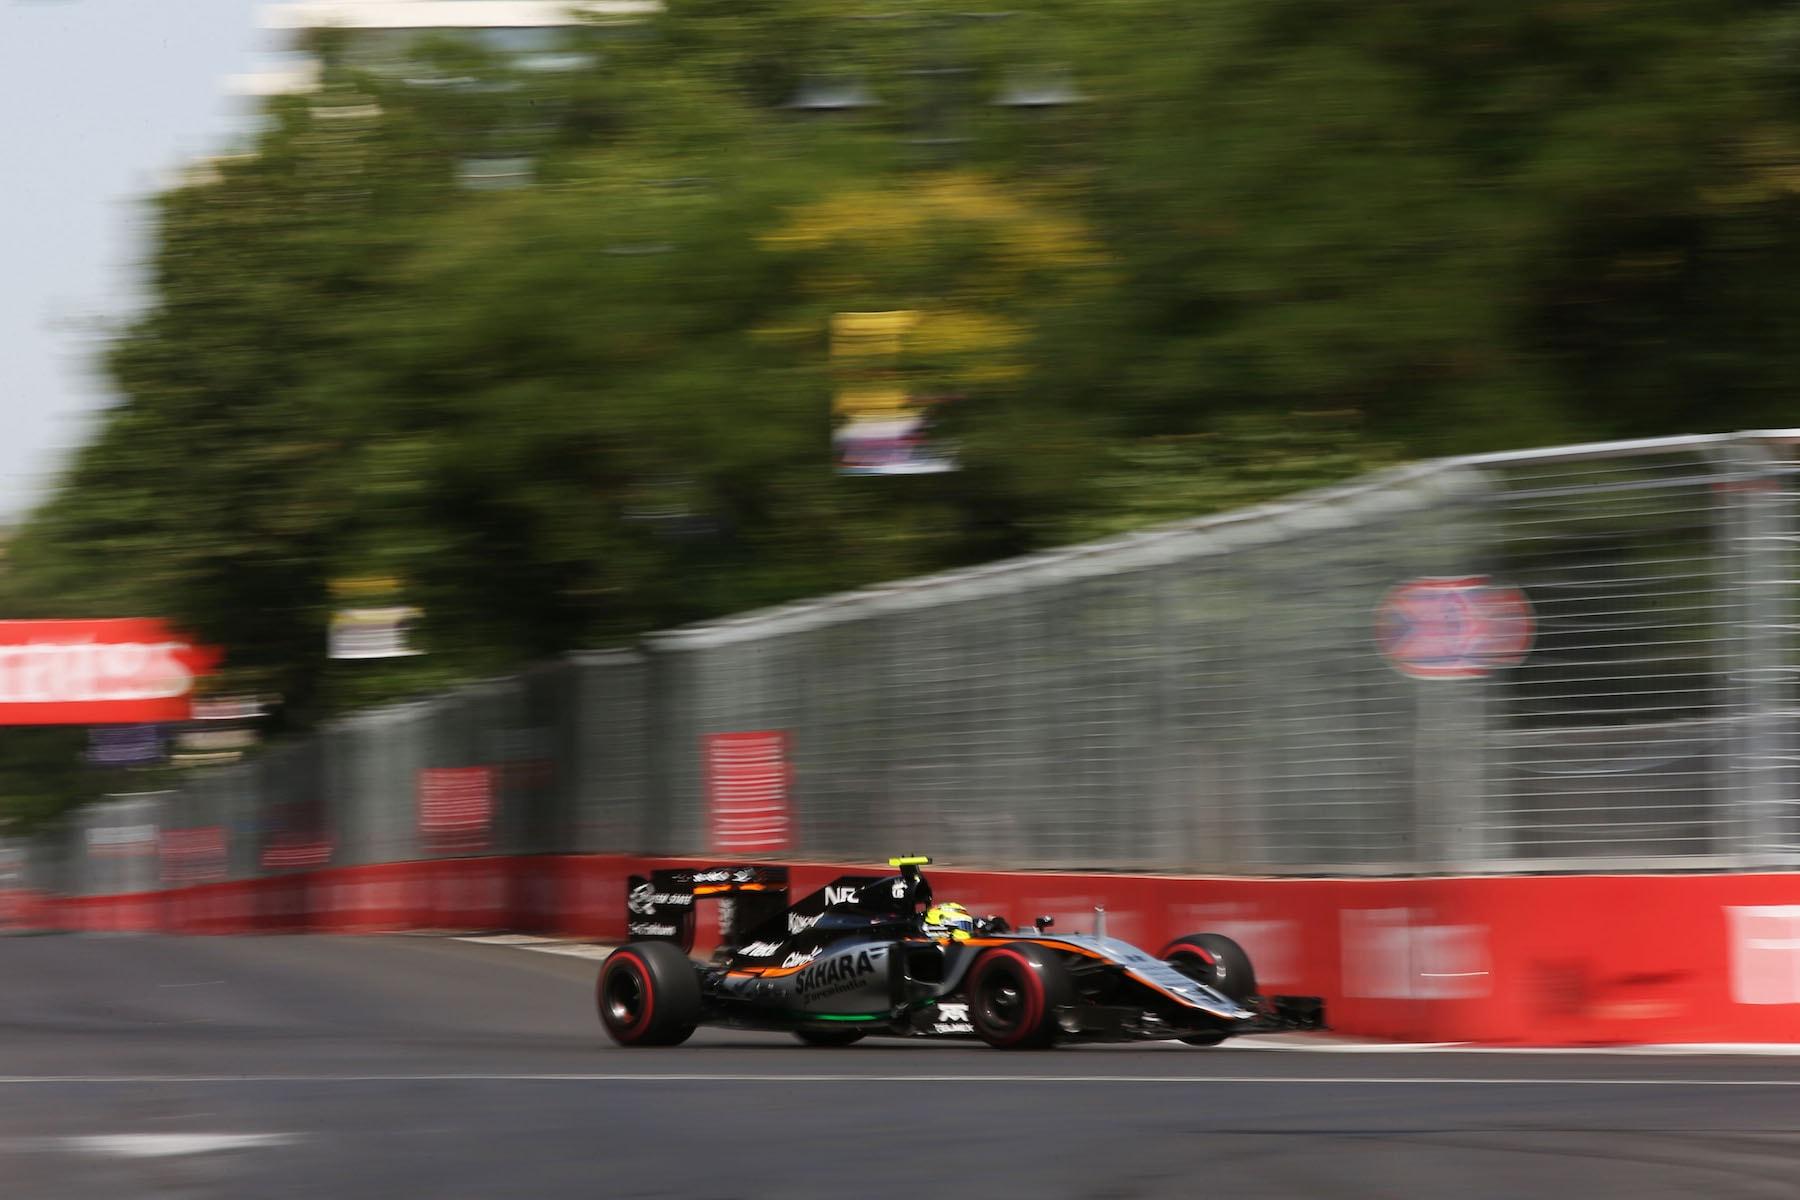 Salracing | Sergio Perez | Sahara Force India